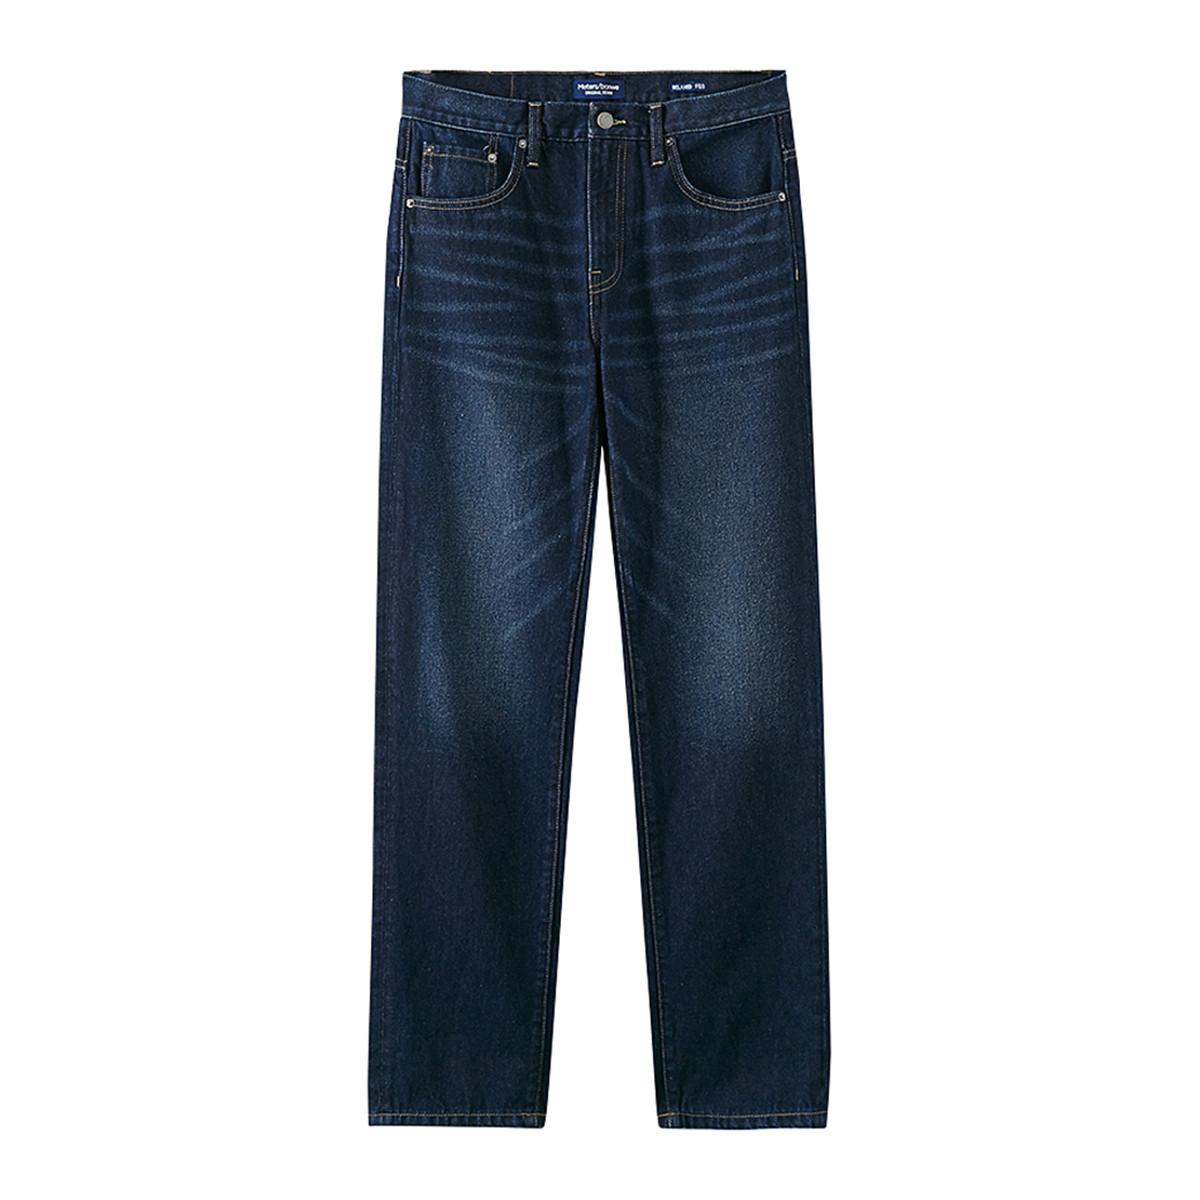 Meters bonwe 美特斯邦威 656W4317539992P659029 男士复古百搭直筒裤牛仔裤